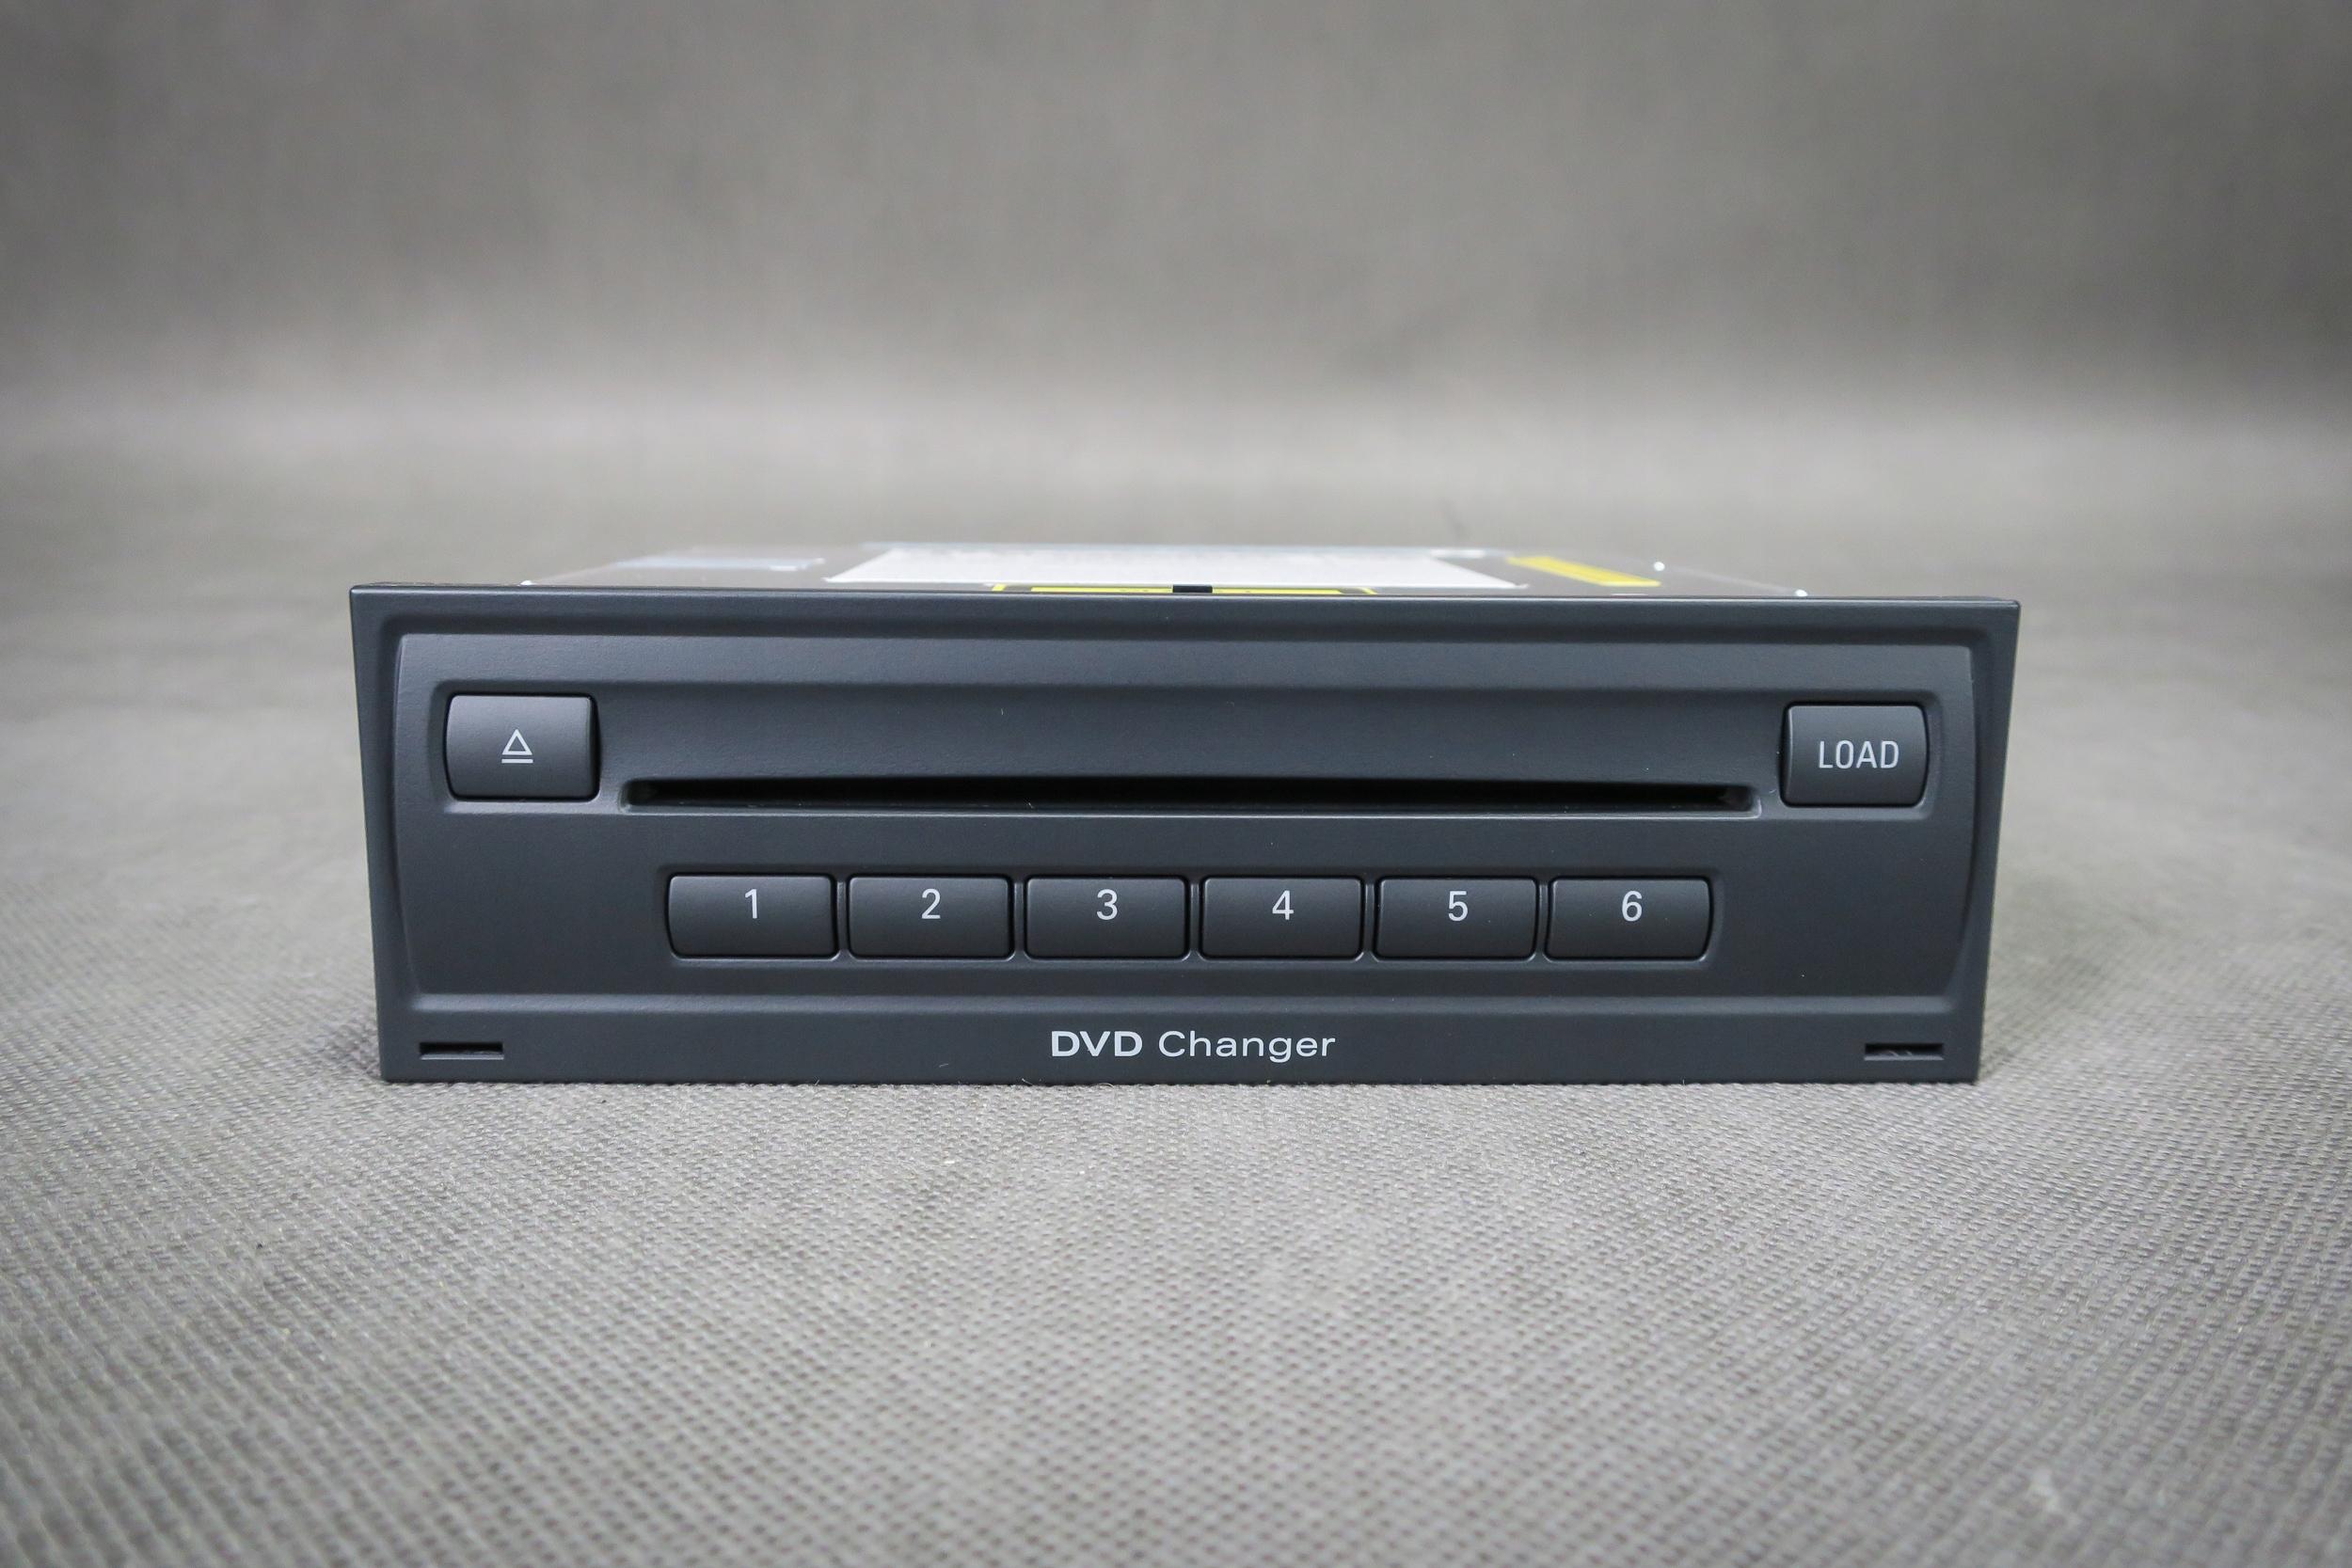 cd-чейнджер dvd audi a6 s6 a7 s7 a8 s8 4h0035108f